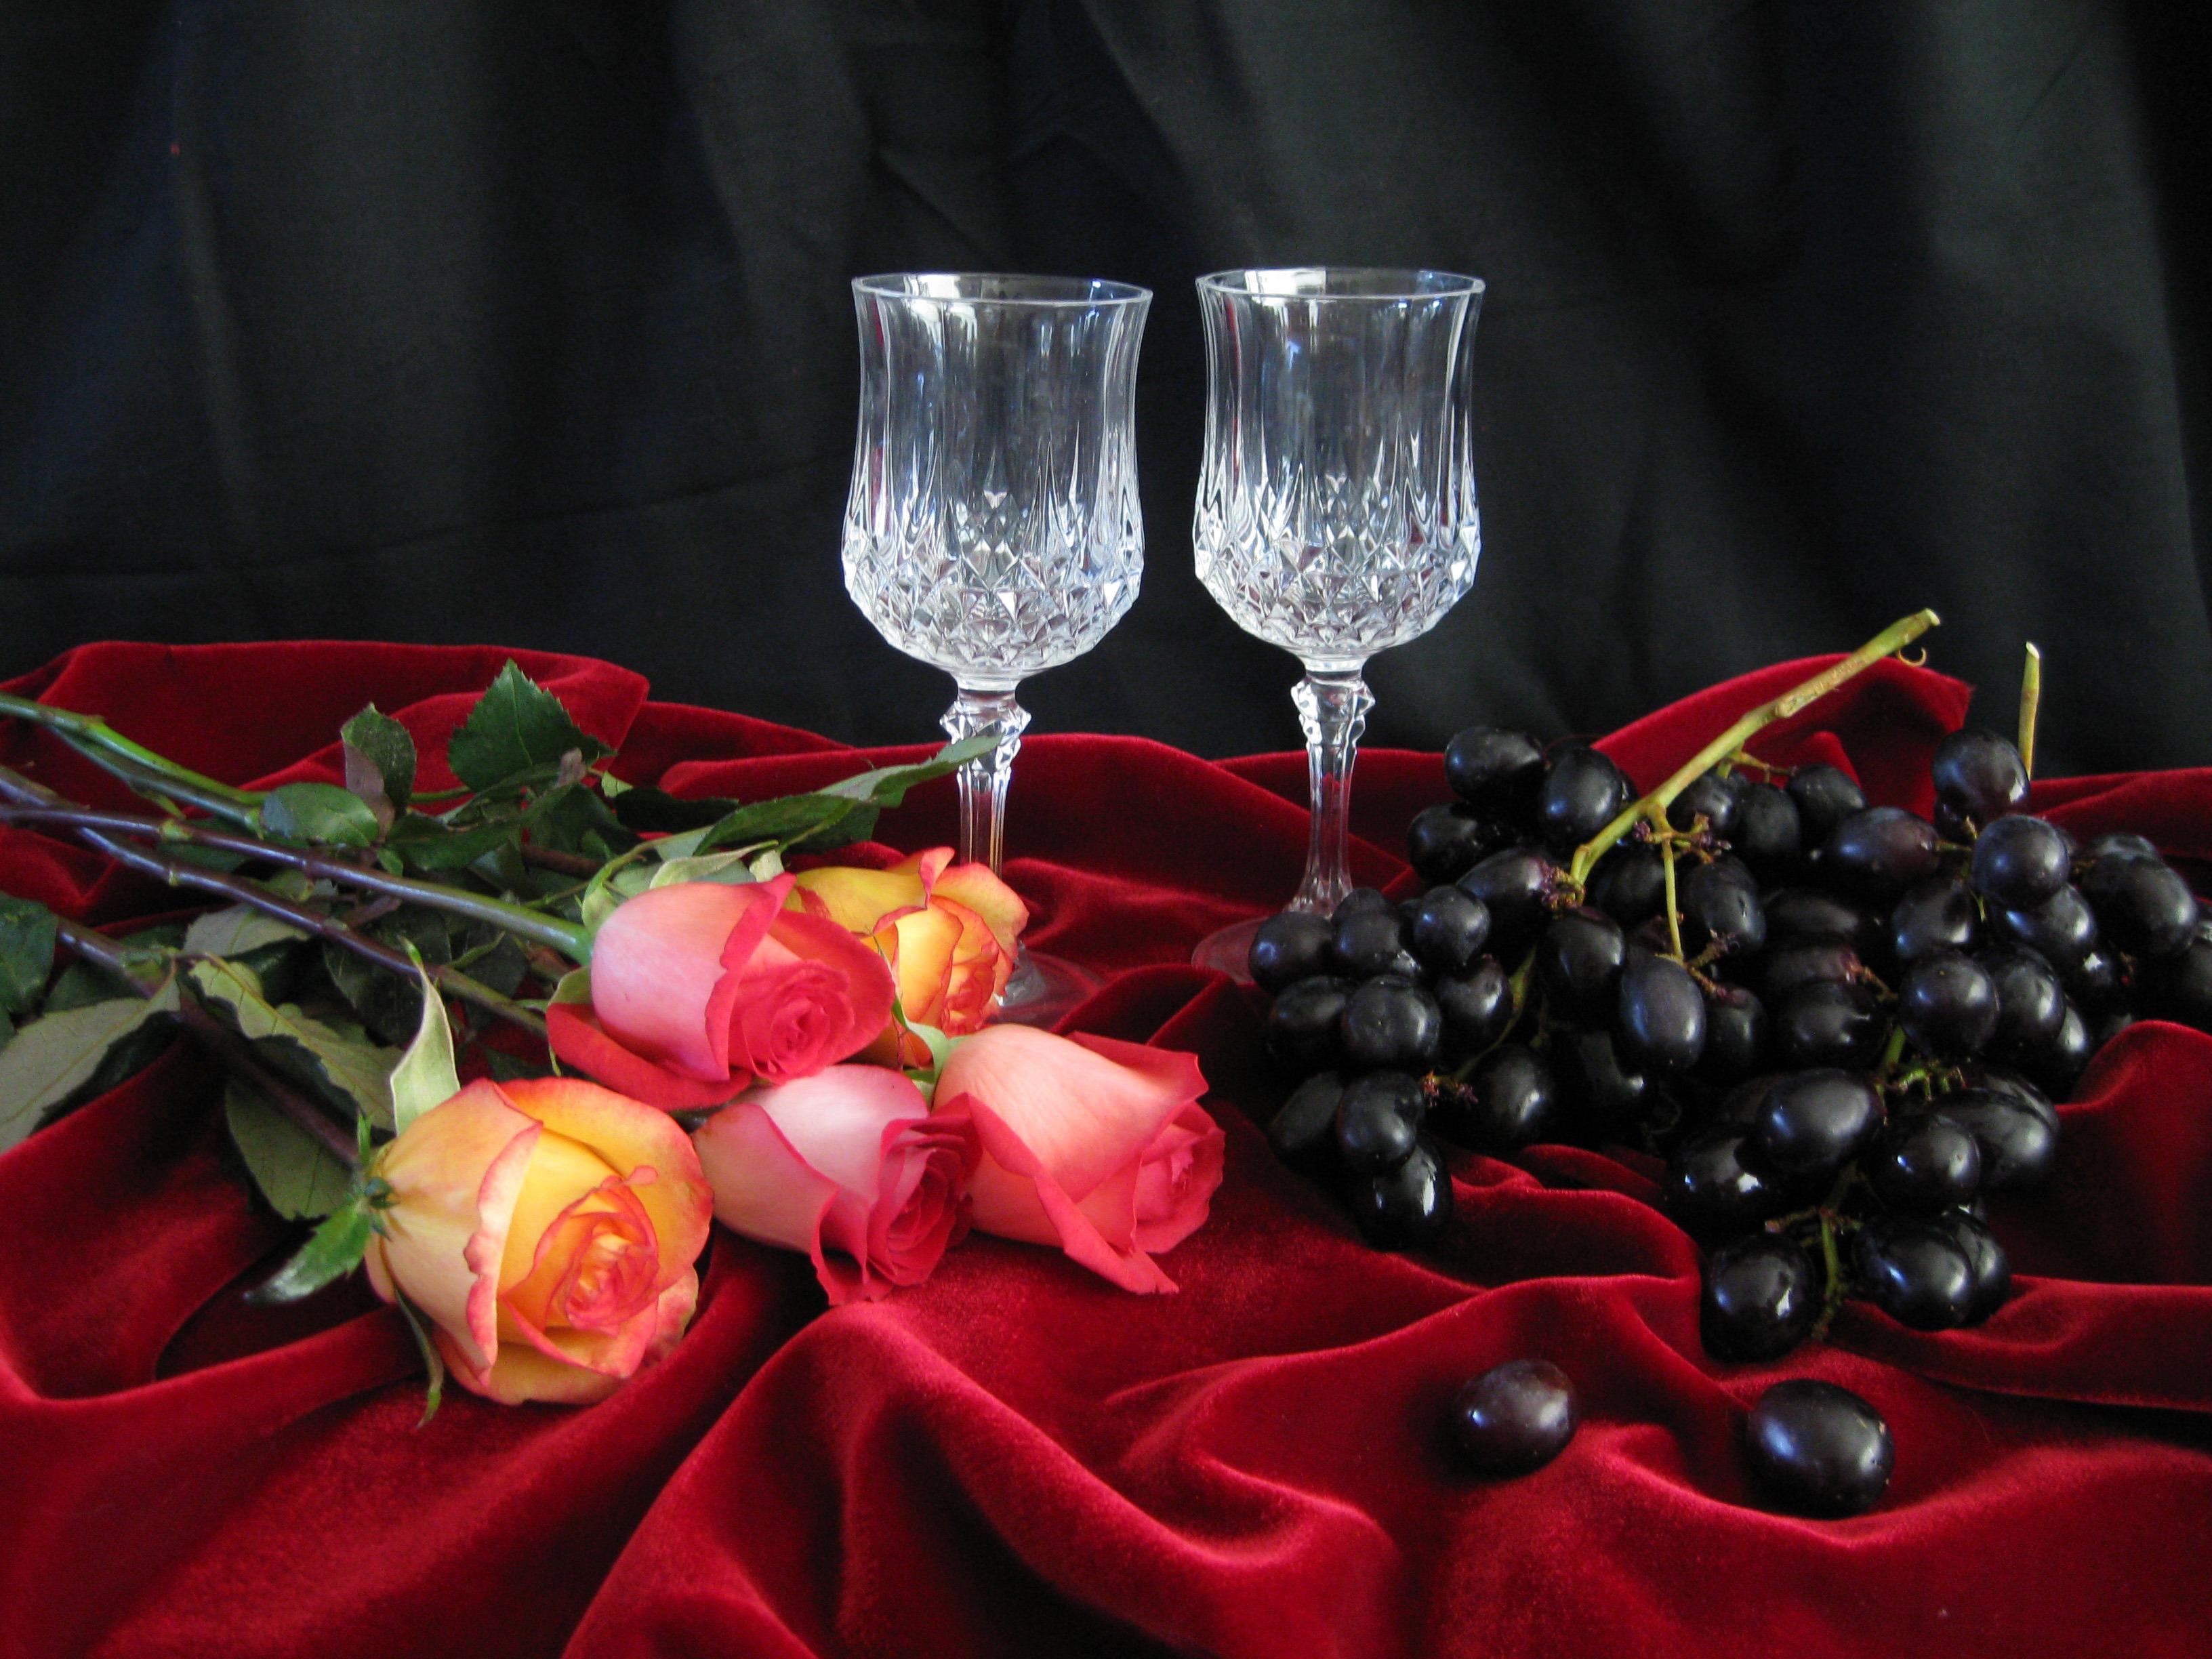 Free Images Petal Celebration Decoration Romantic Red Wine